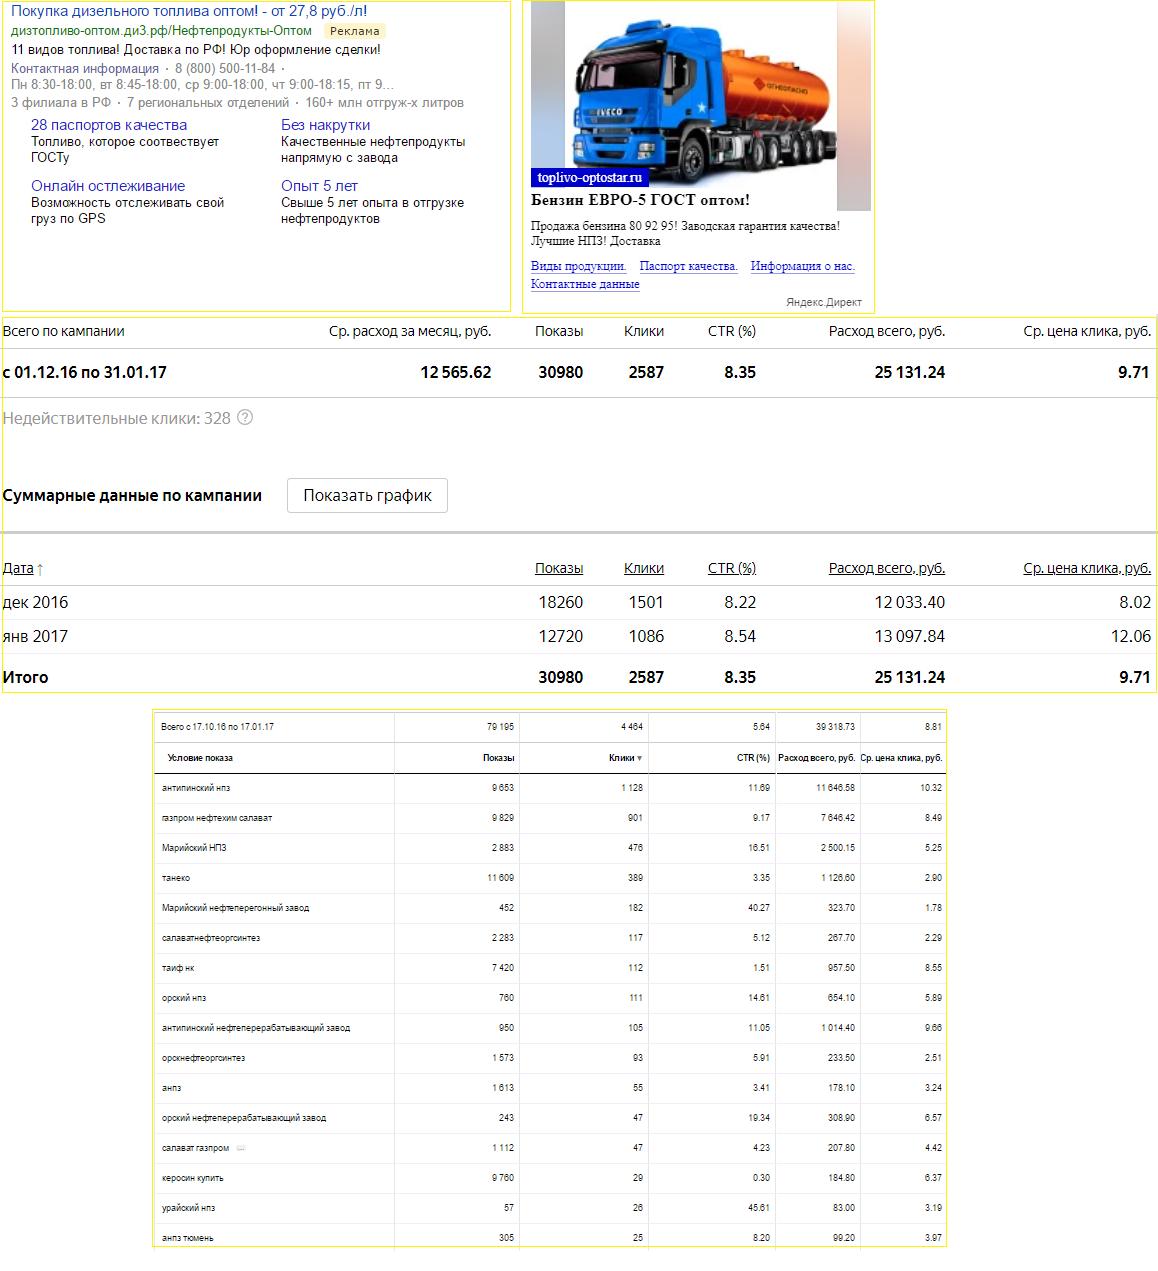 Директ. Продажа нефтепродуктов CTR 8,35% /  Цена клика 9,71 руб. / Цена лида 163 руб.  ▼ПОДРОБНЕЕ▼